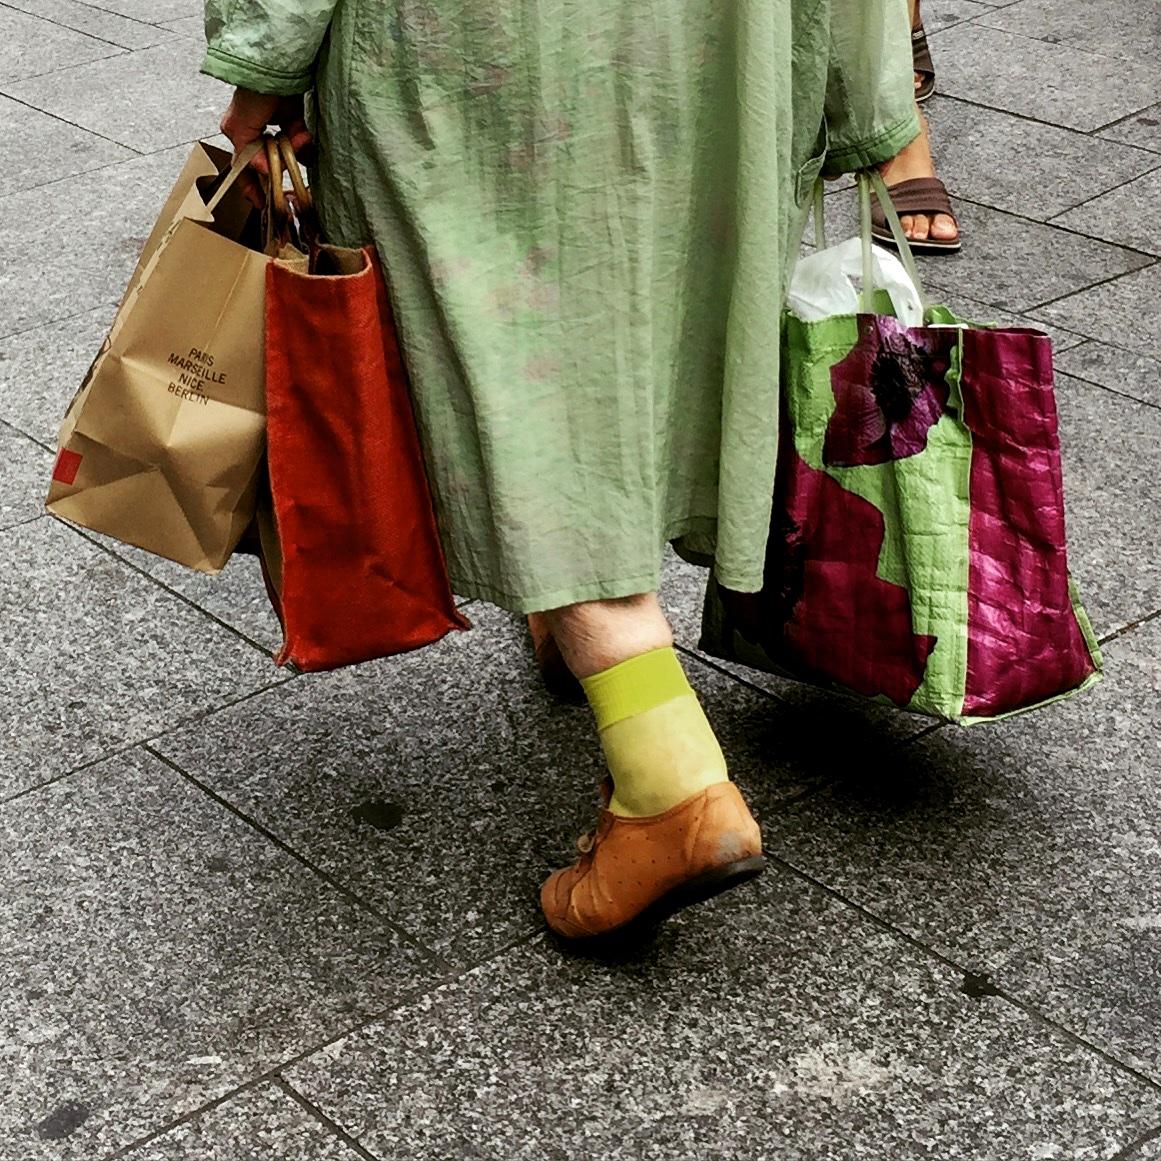 shopping_bags 295.jpg